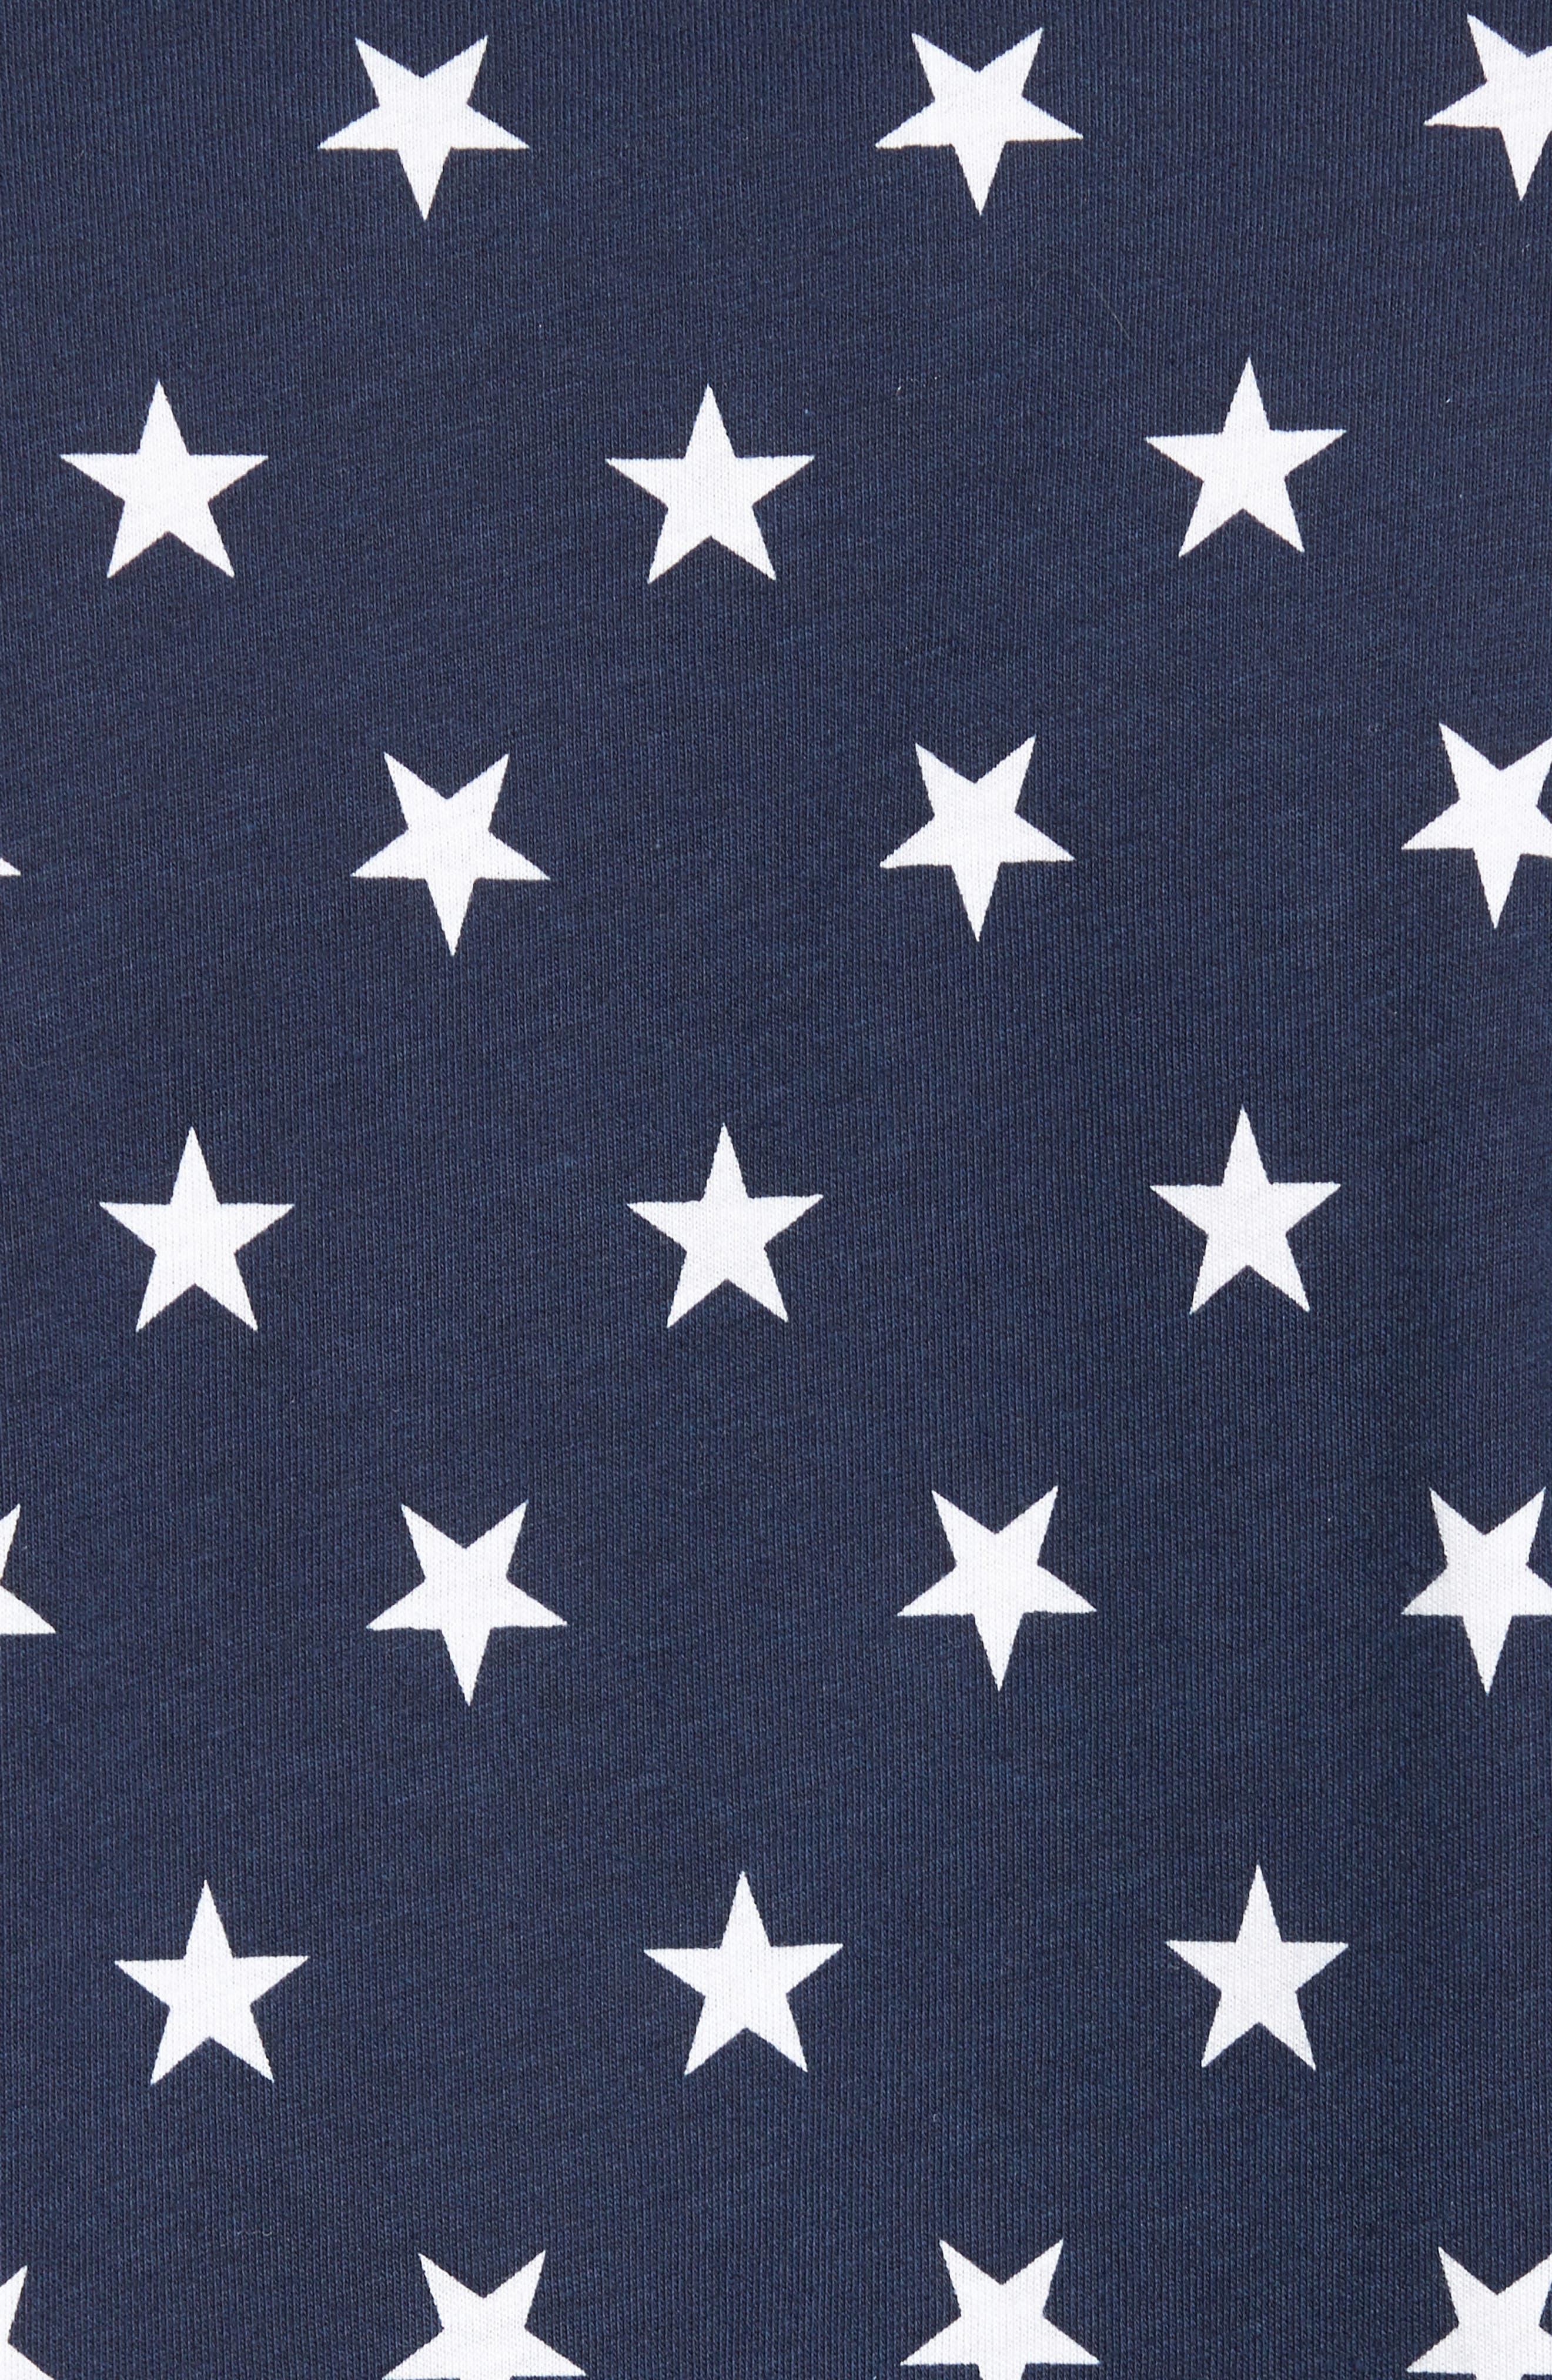 International Collection Star Print T-Shirt,                             Alternate thumbnail 5, color,                             Cosmic Blue Star Print